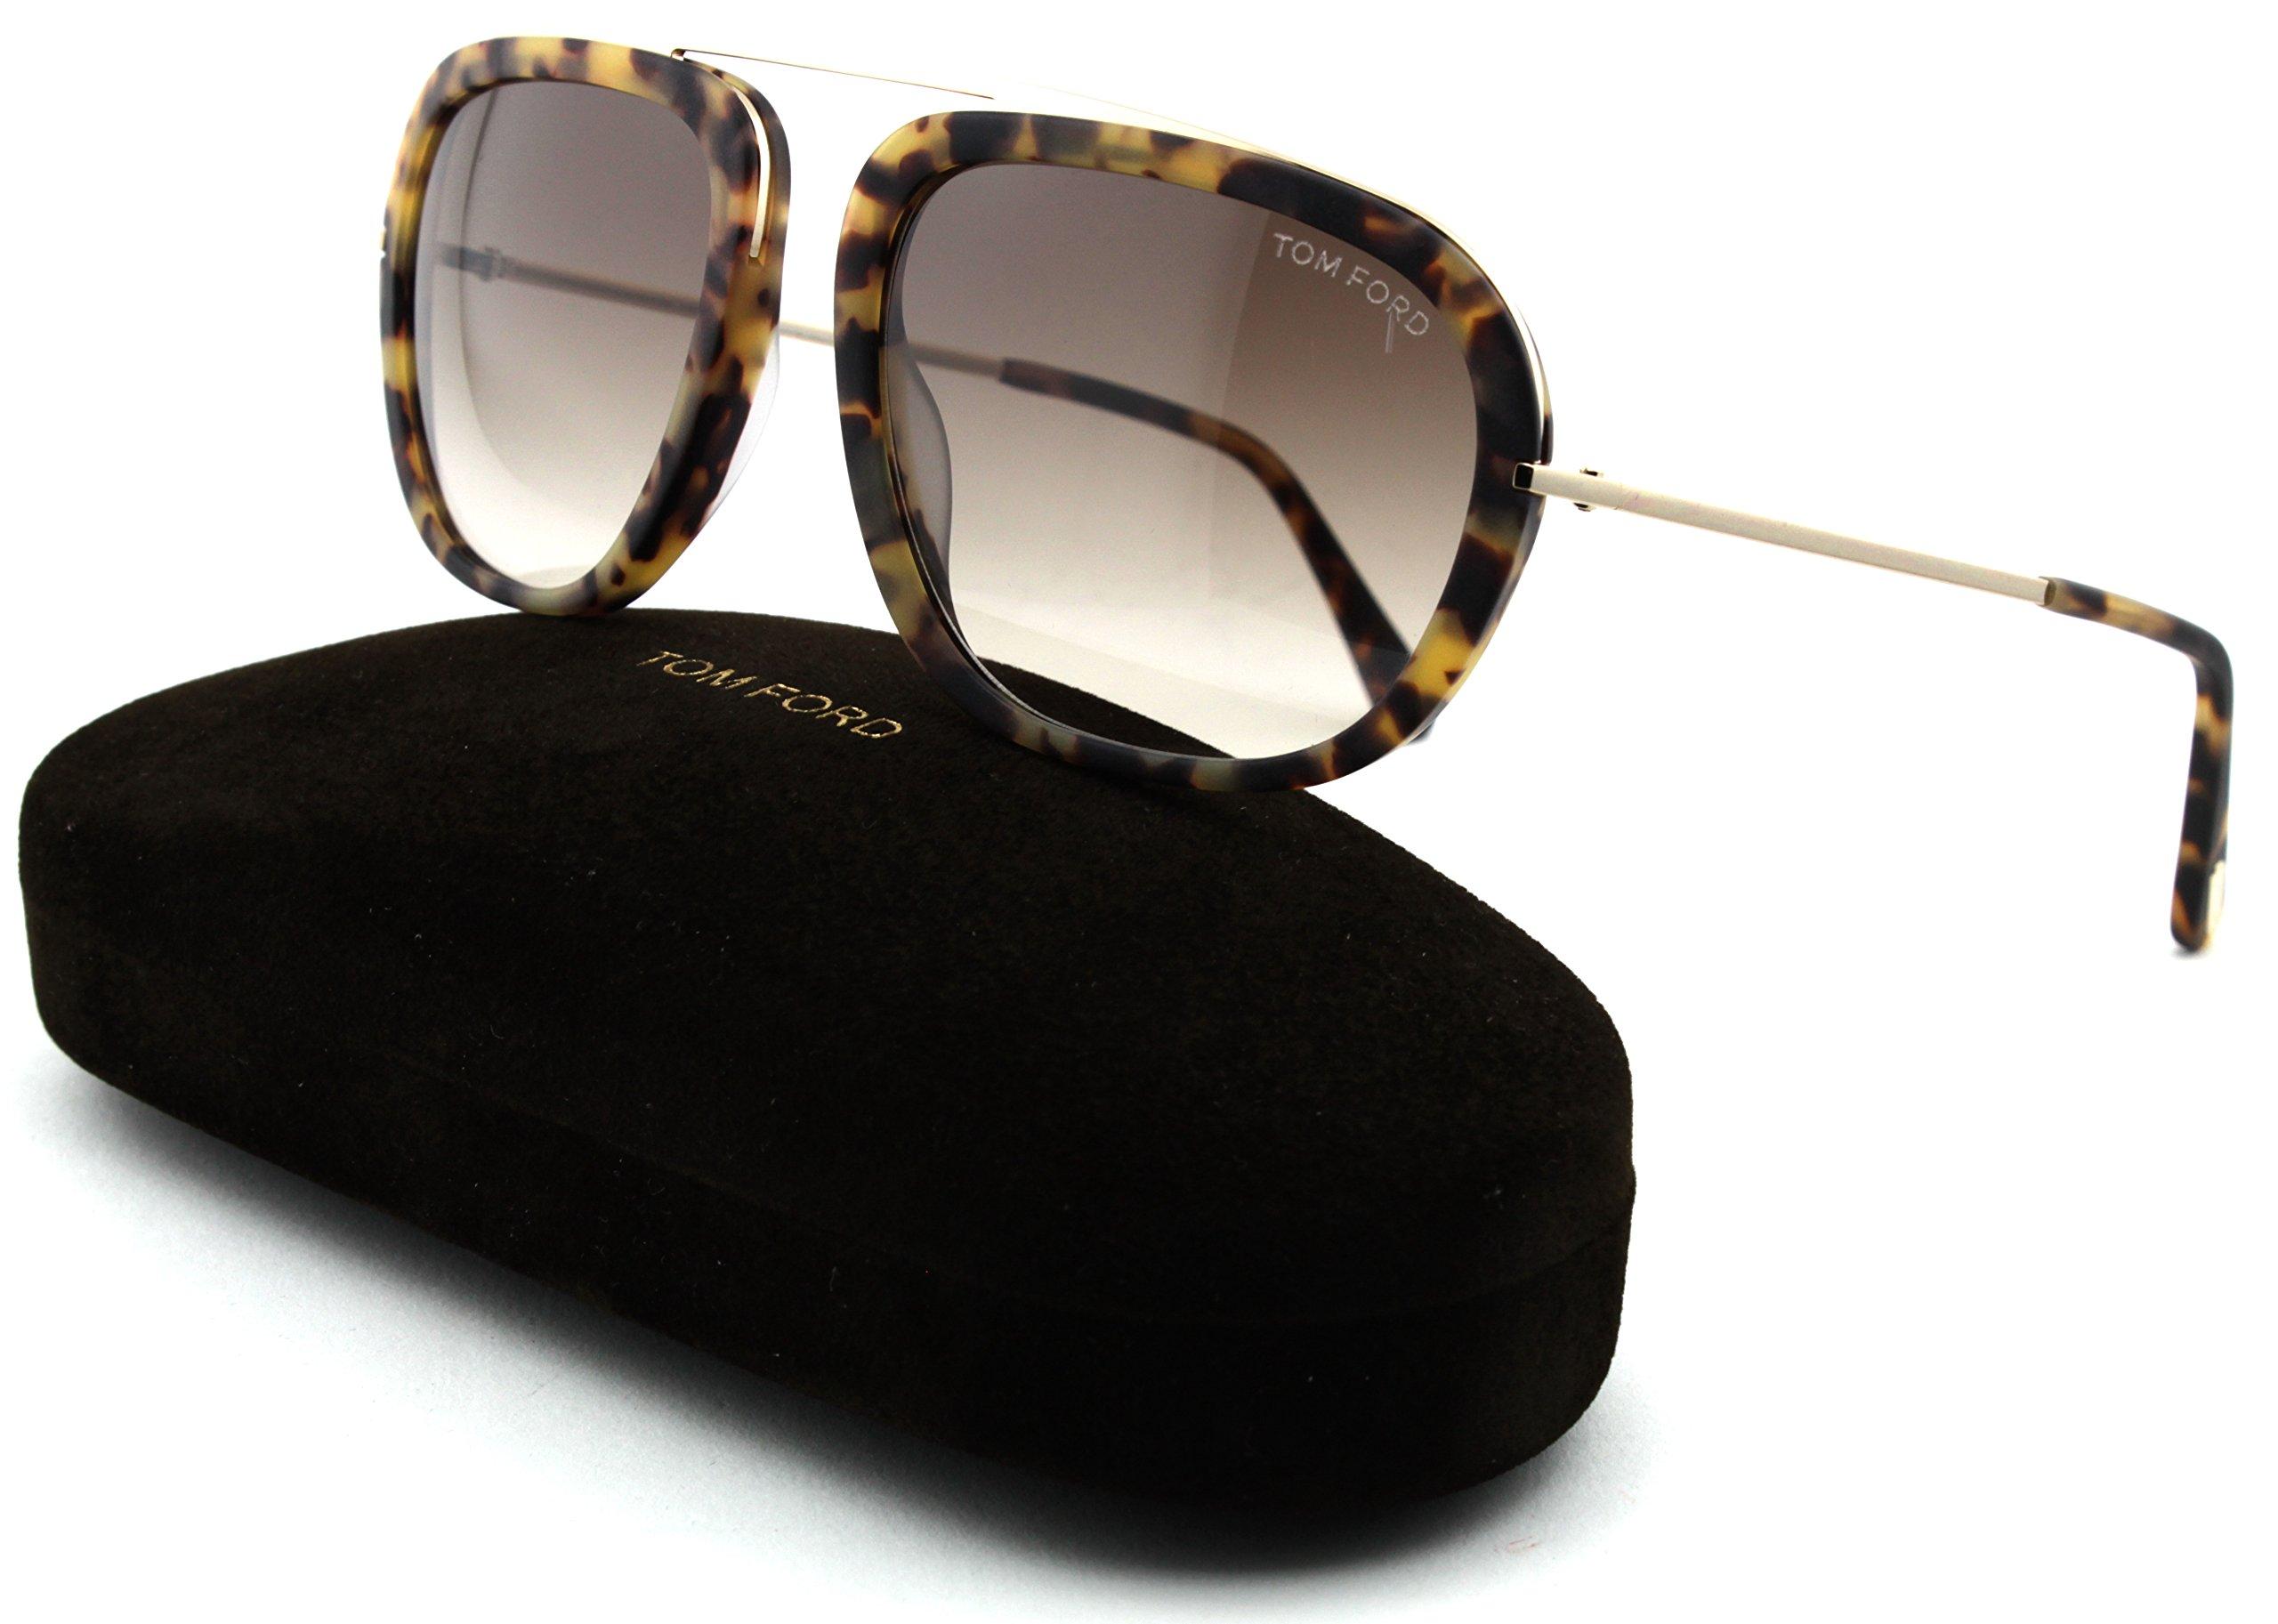 Tom Ford FT 0453 Johnson Unisex Metal Geometric Sunglasses (Blonde Havana Frame, Gradient Brown Lens 53F)